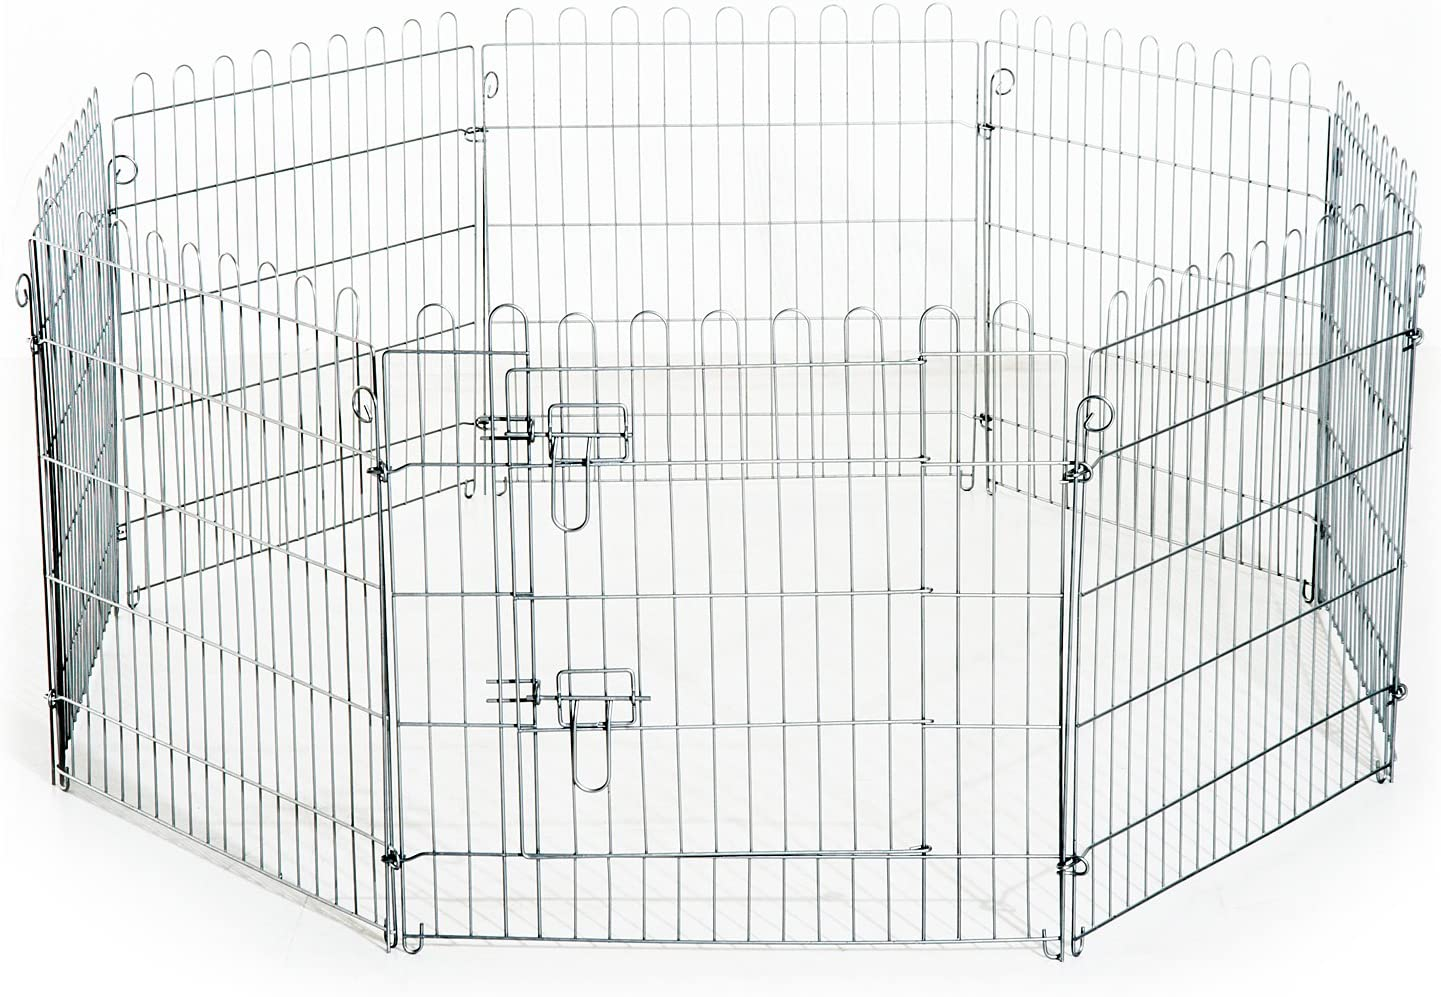 PawHut Parque para Cachorros Valla para Cachorros Animales Rejilla Medidas 63 x 60 CM